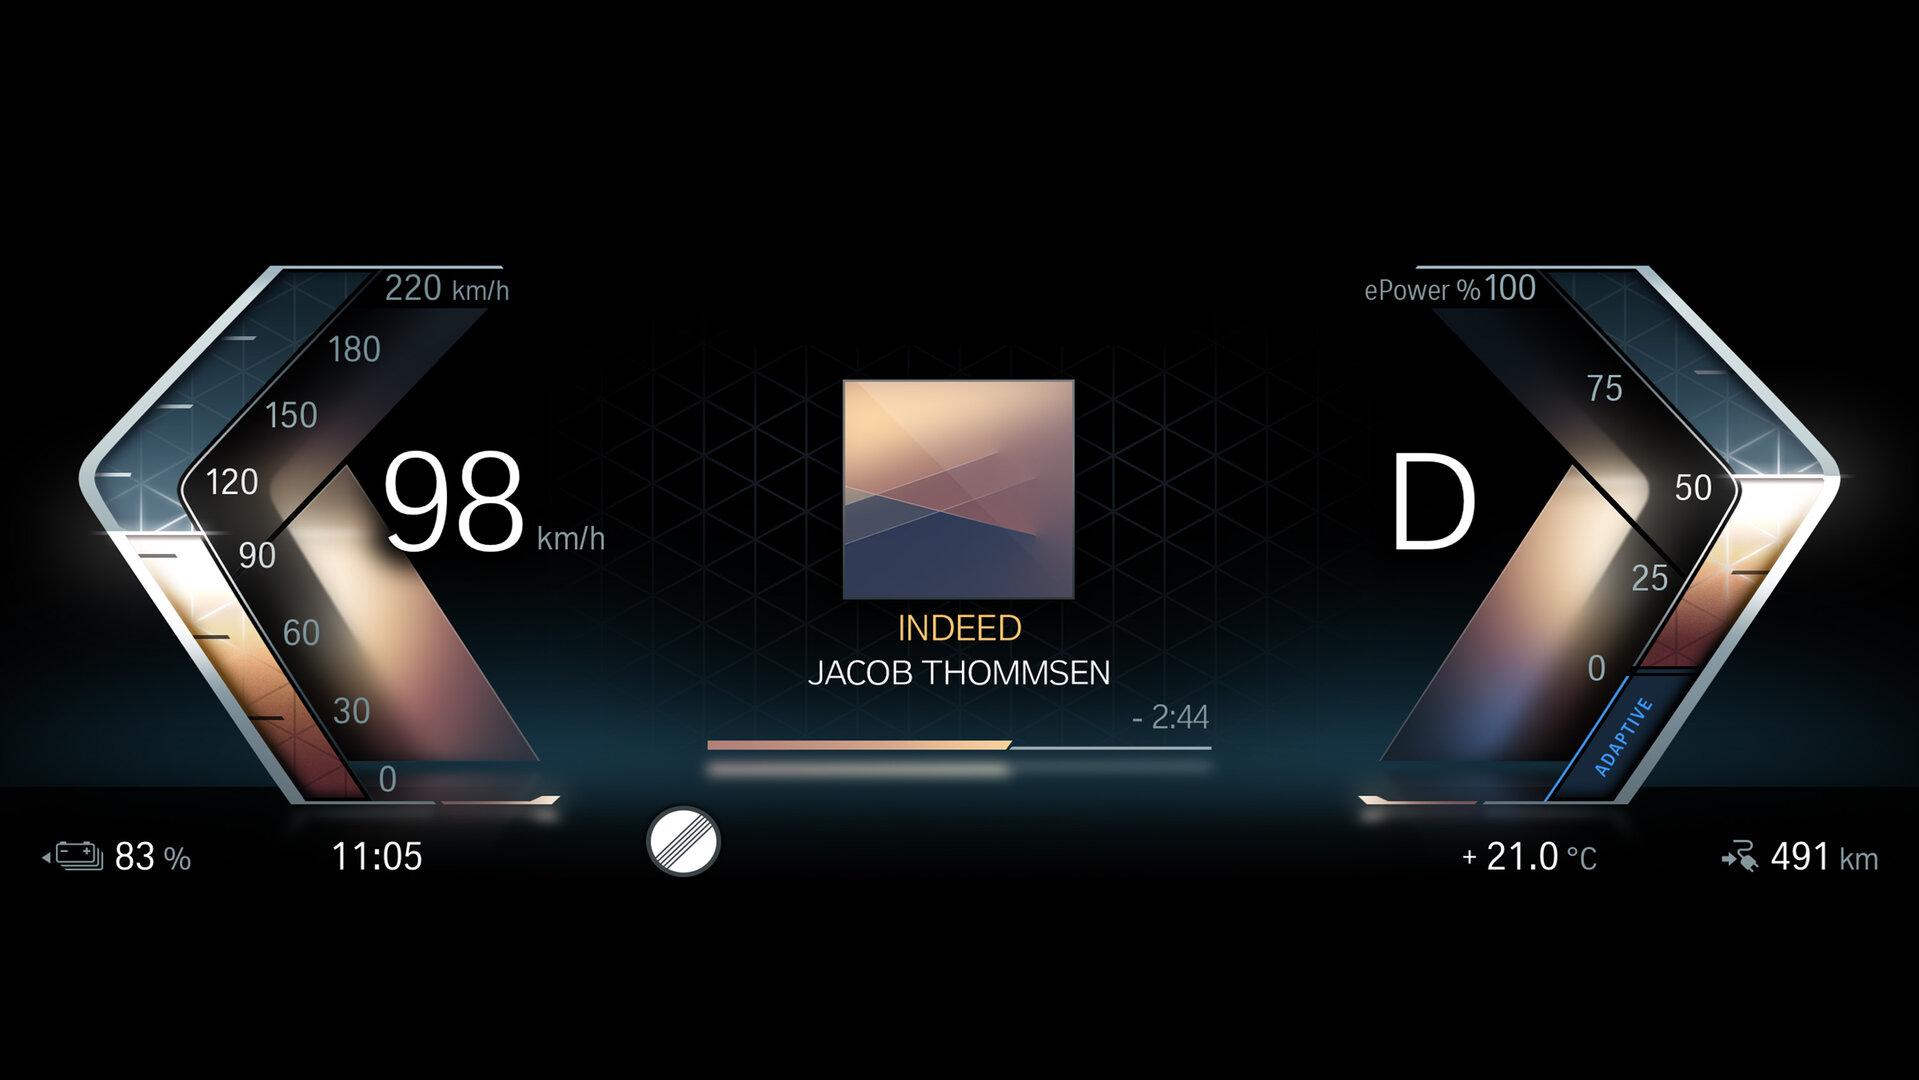 BMW iDrive Information Display – Drive Layout